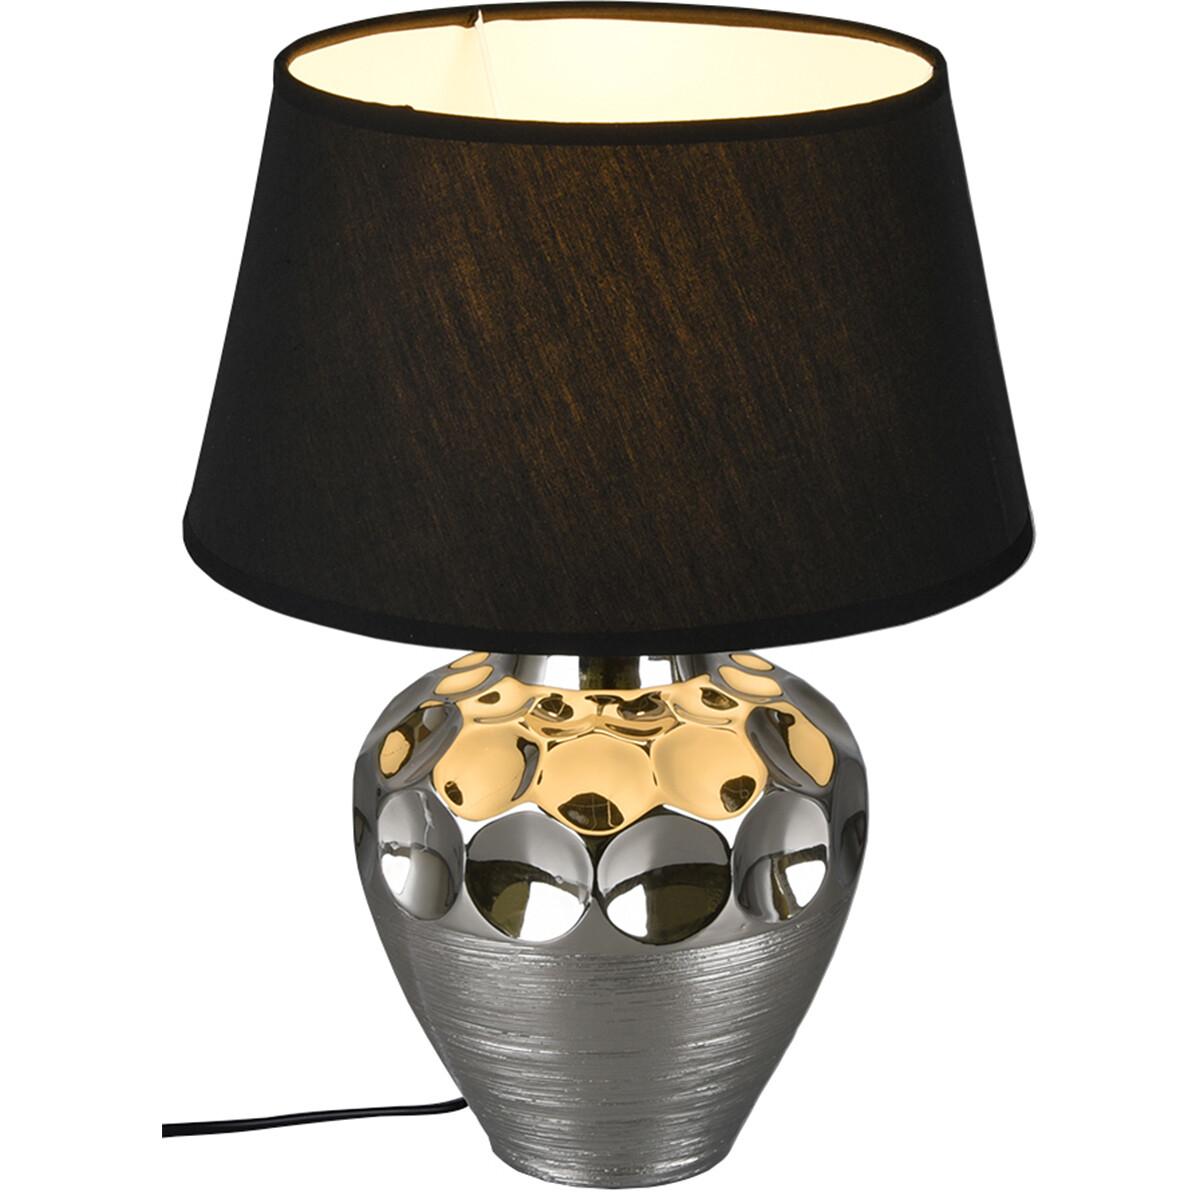 LED Tafellamp - Tafelverlichting - Trion Lunda - E27 Fitting - Rond - Mat Zilver - Keramiek